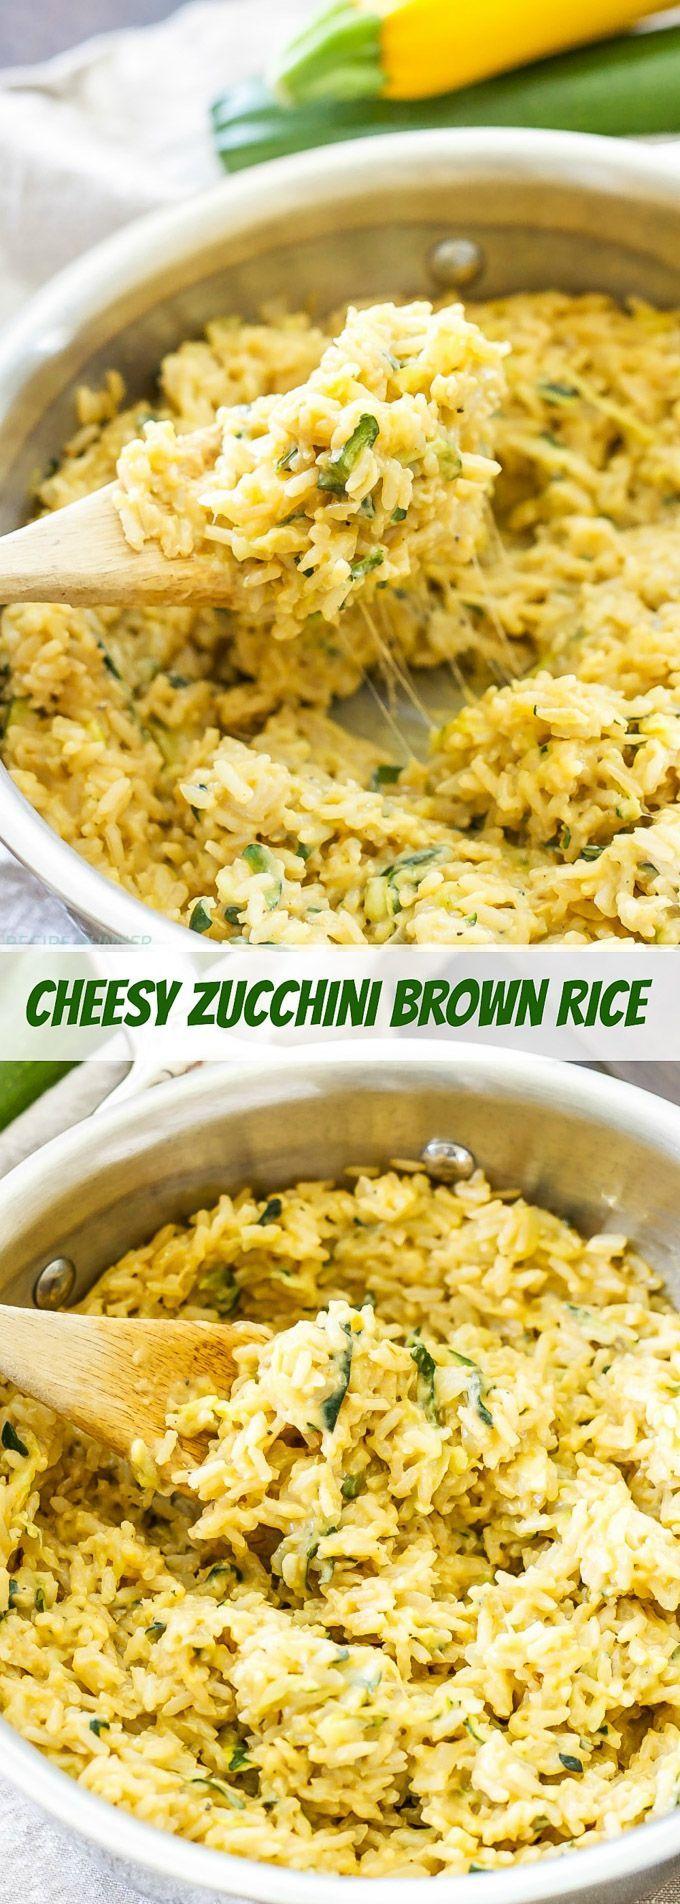 Cheesy Zucchini Brown Rice   Whole grain, gluten free, vegetarian and loaded…